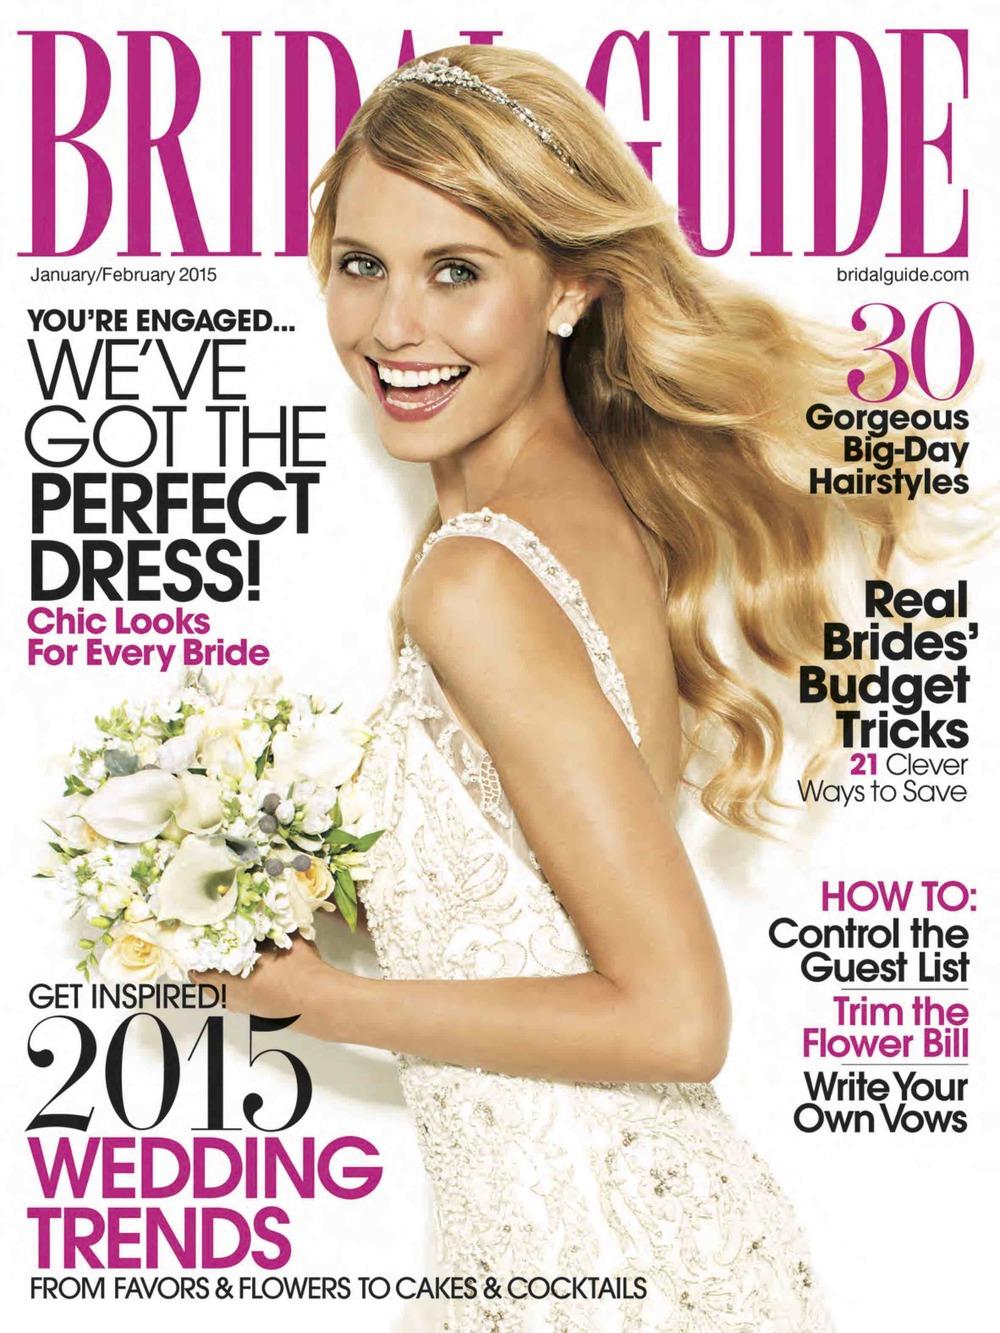 Bridal Guide Cover Jan-Feb 2015.jpg